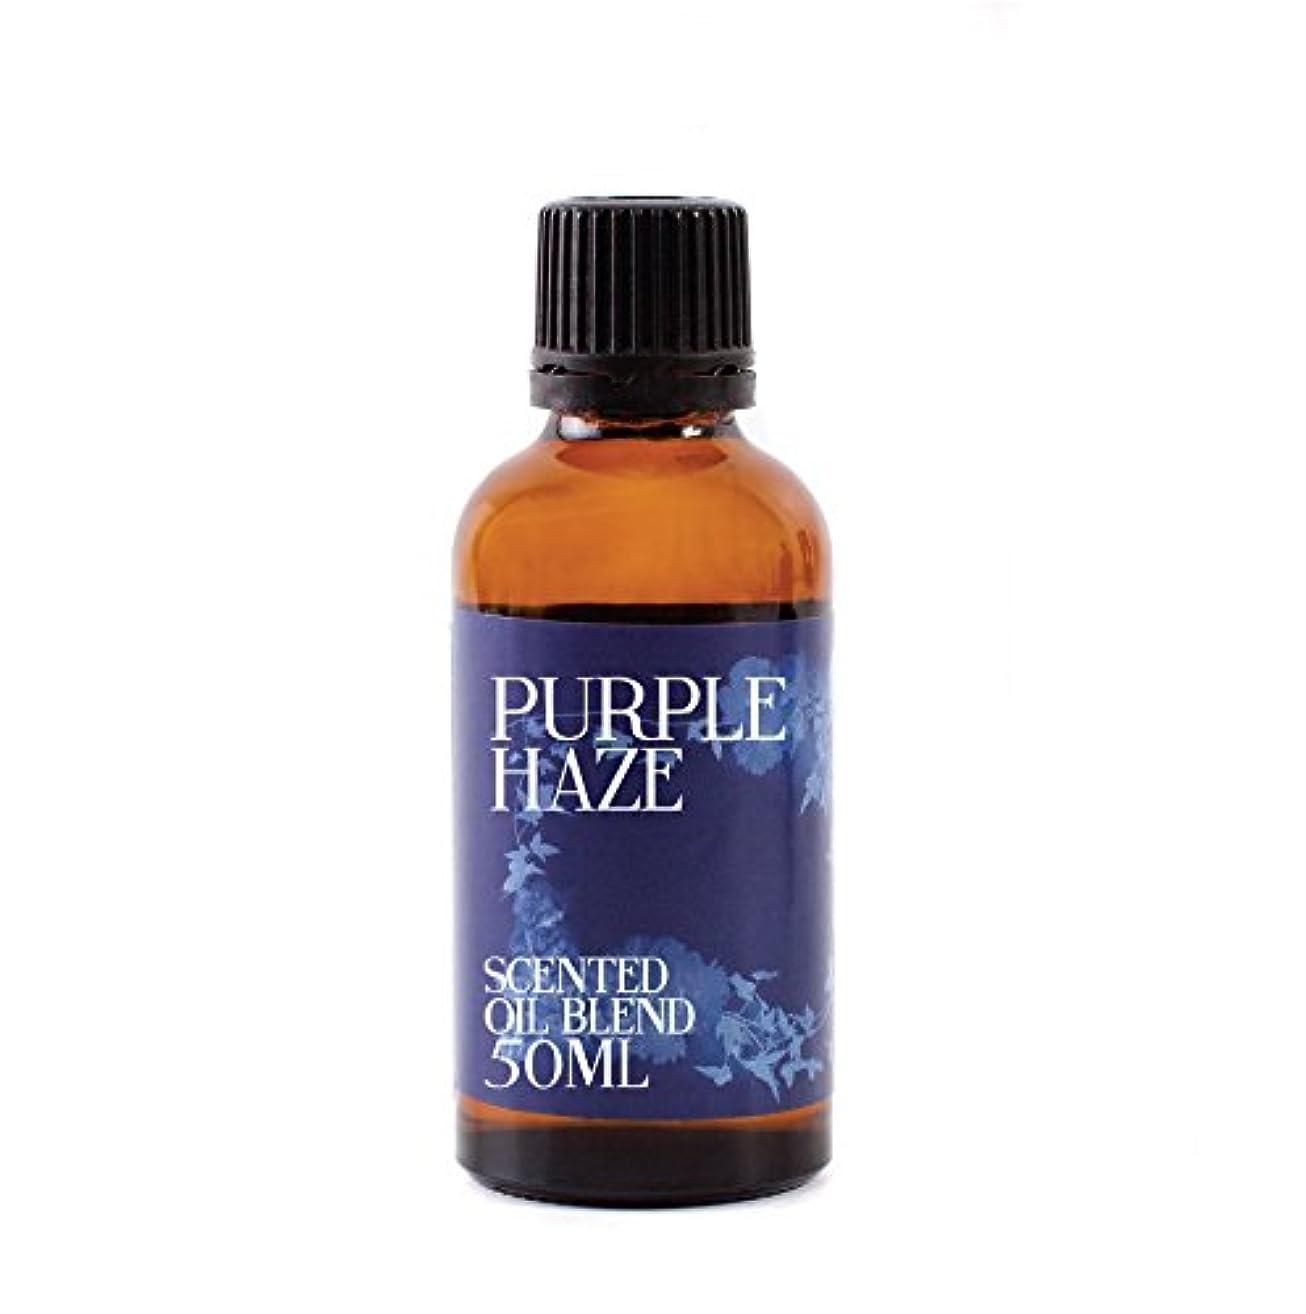 Mystic Moments | Purple Haze - Scented Oil Blend - 50ml